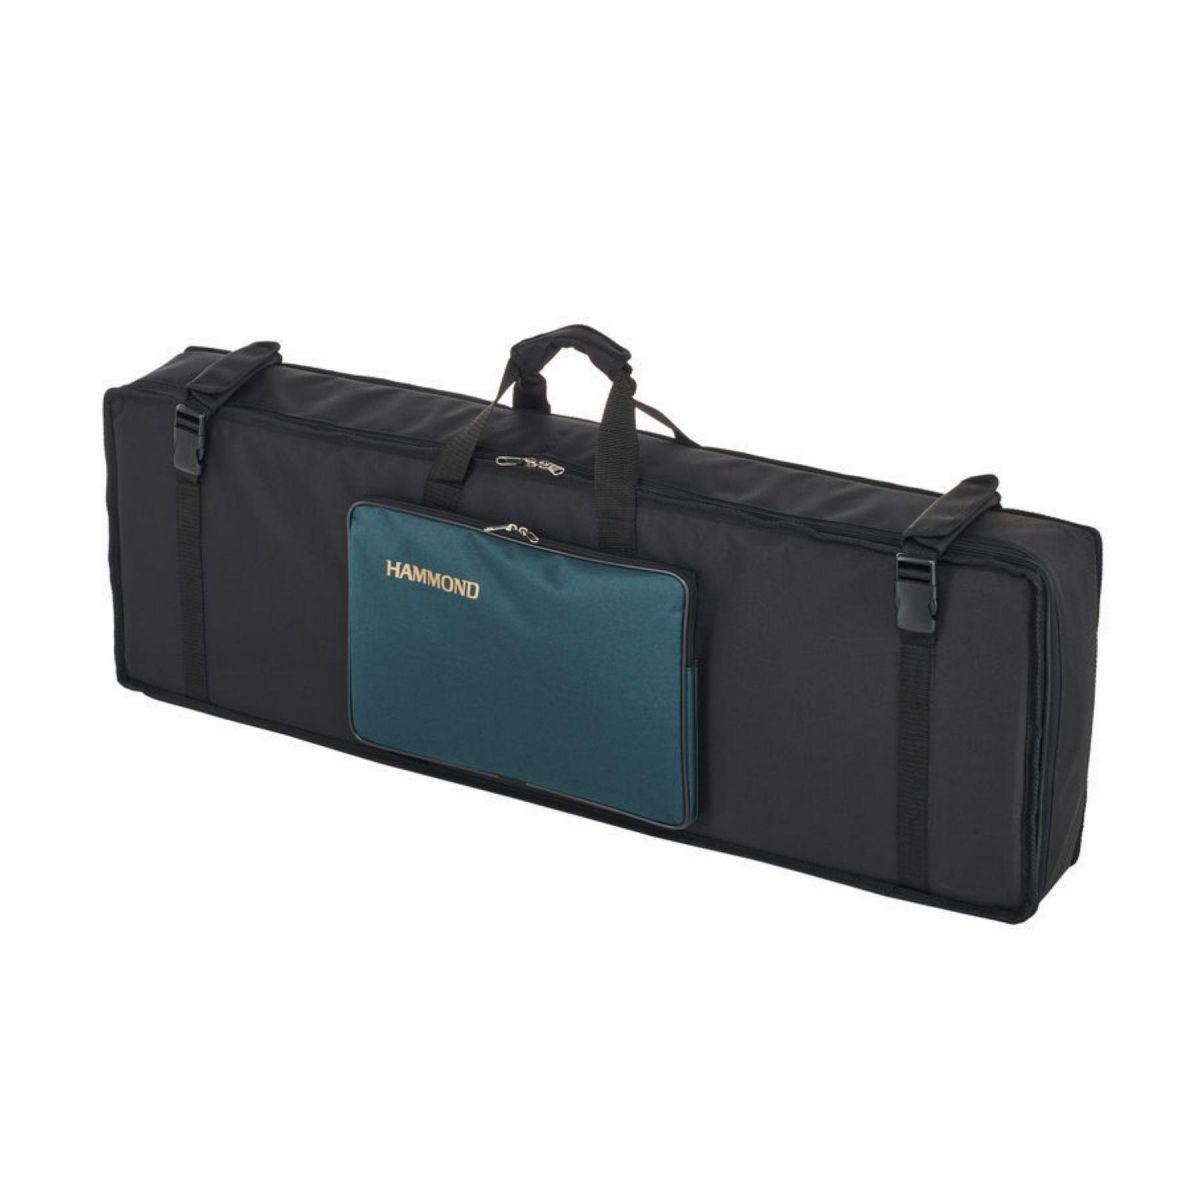 Borsa Organo SK PRO61 Hammond 103x32x12cm